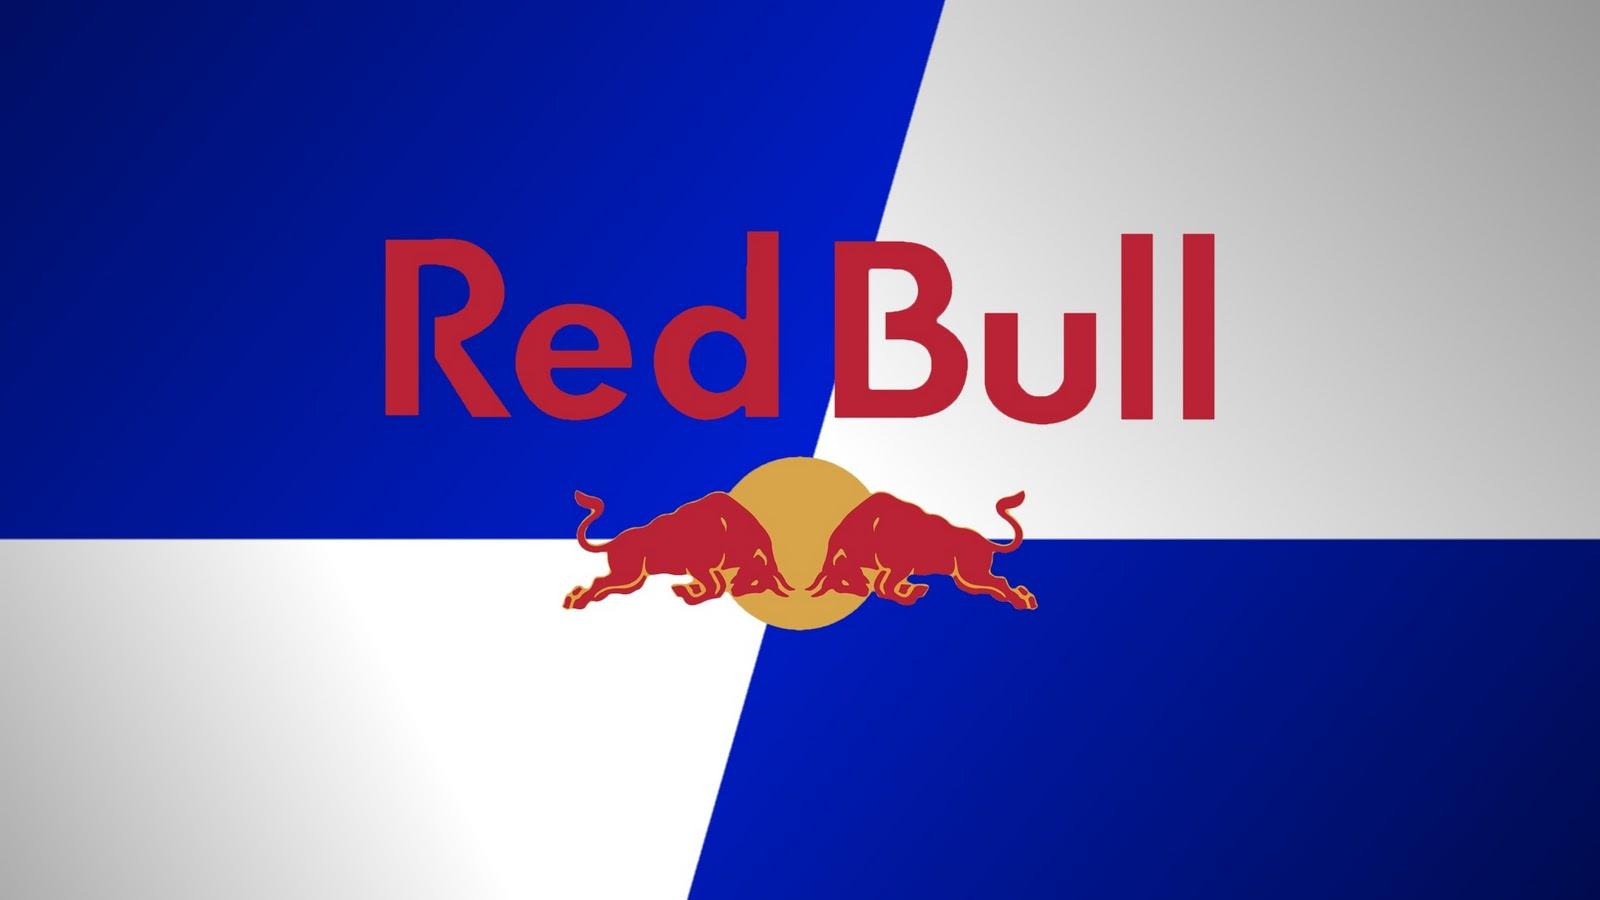 Red Bull clipart wallpaper Red Red Label wallpaper Bull